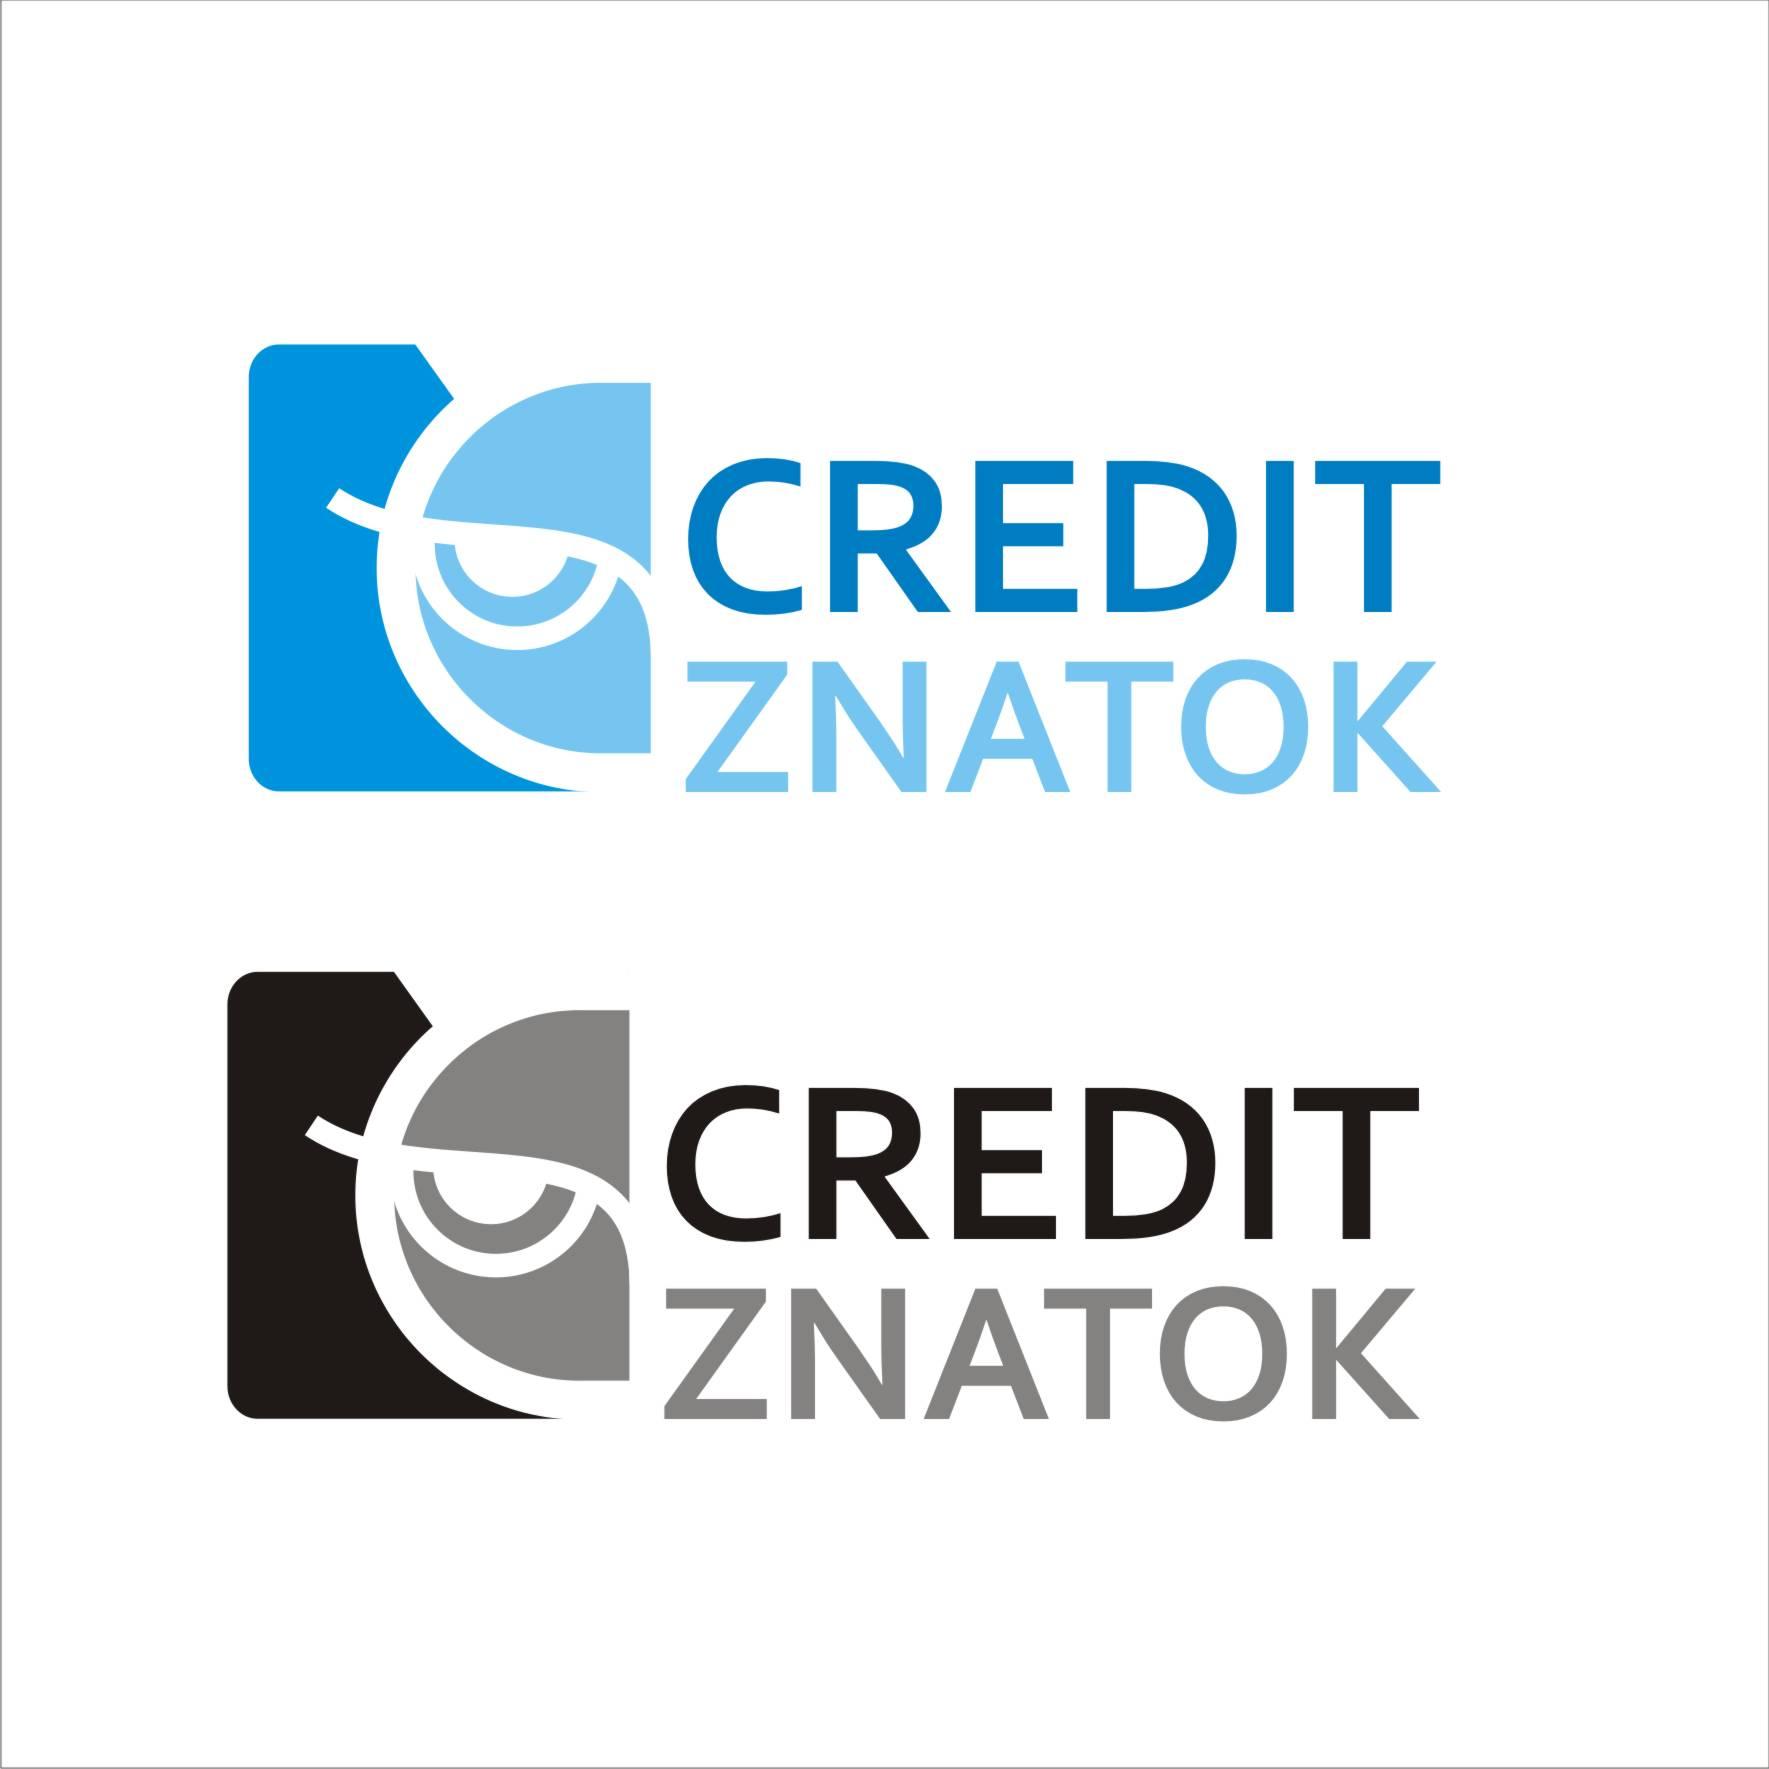 creditznatok.ru - логотип фото f_339589a9fc46468a.jpg